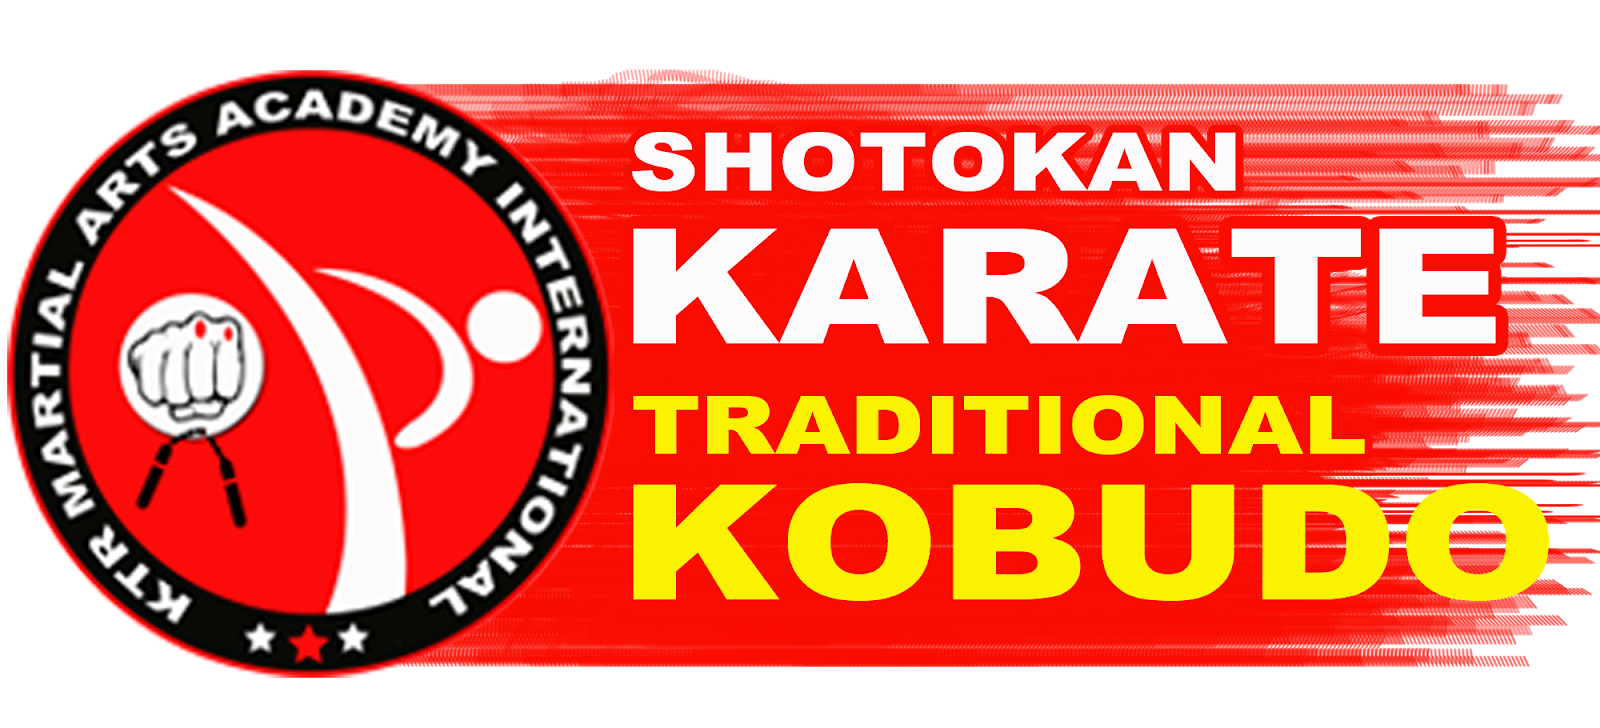 KTR Martial Arts Academy International